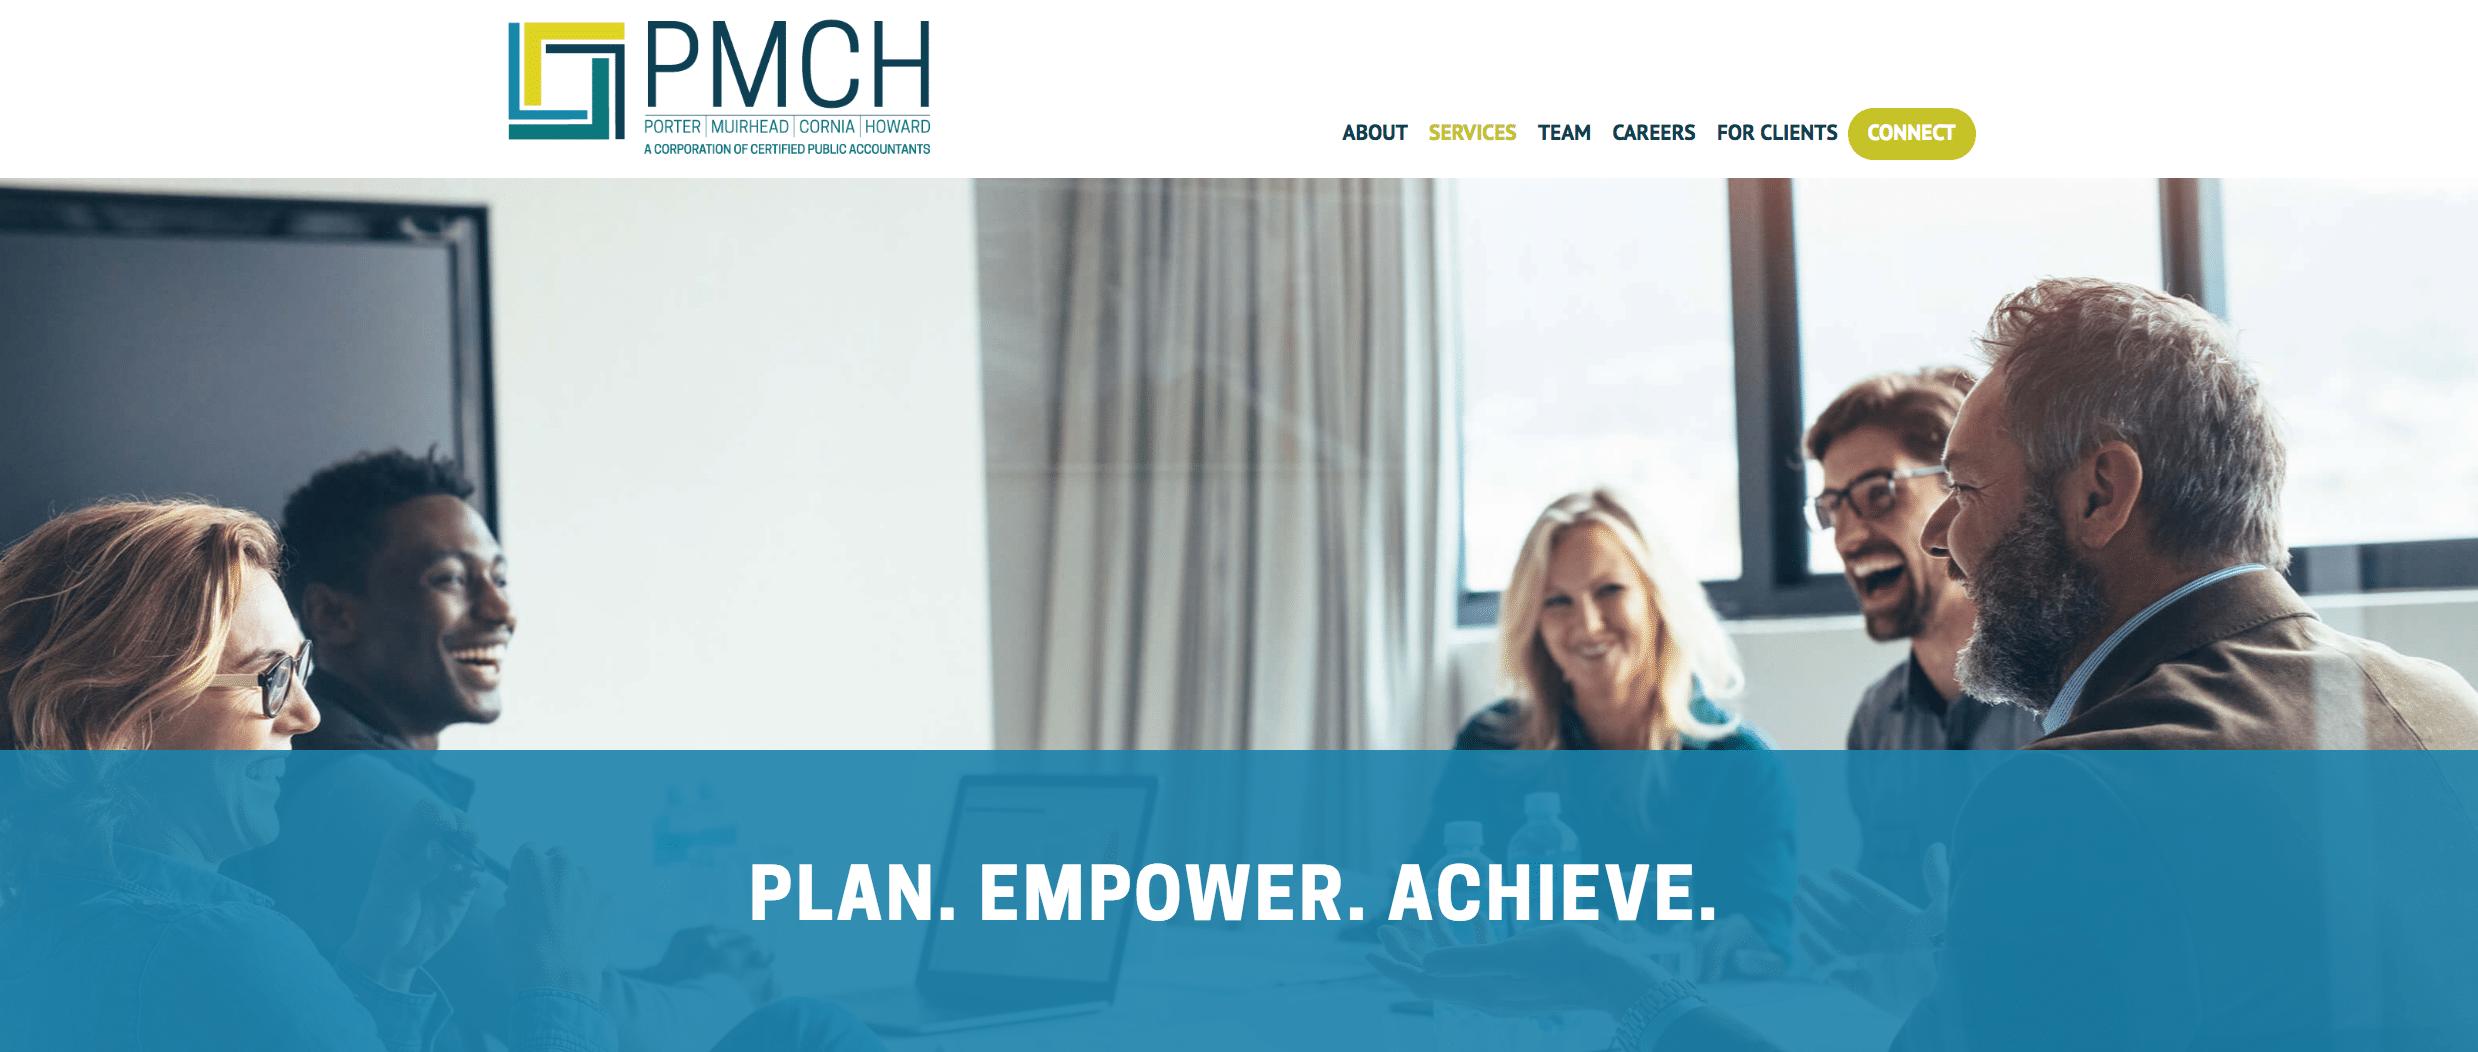 PMCH Website